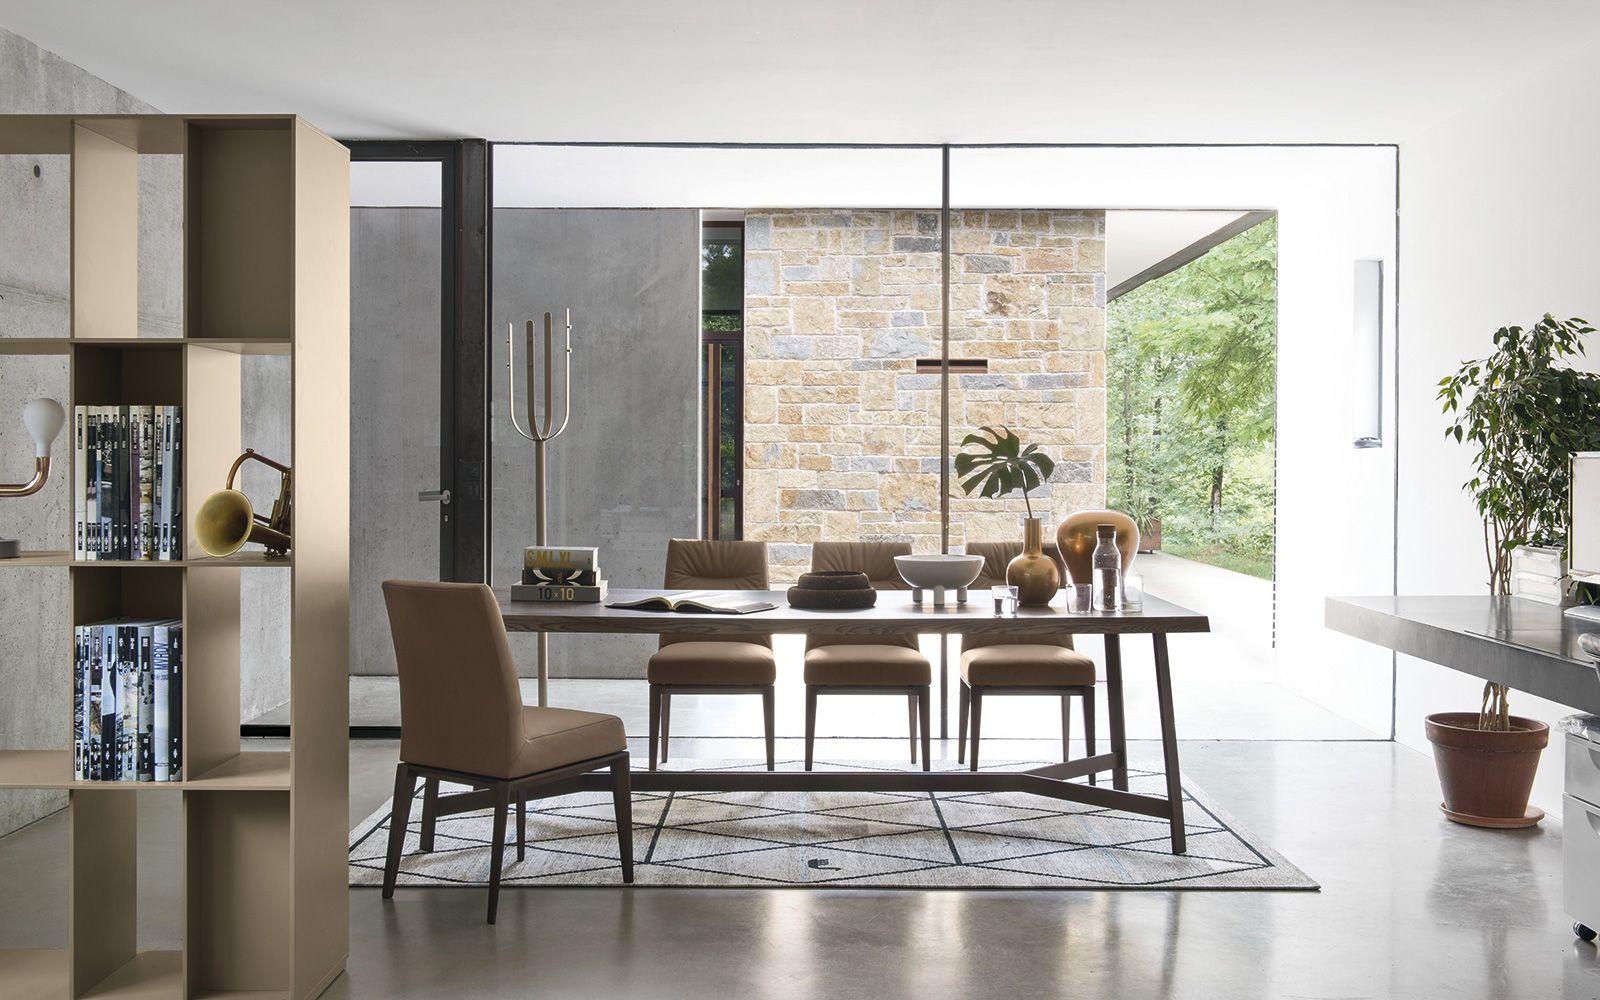 Calligaris Home Furnishing: italian Design furniture   Furniture ...